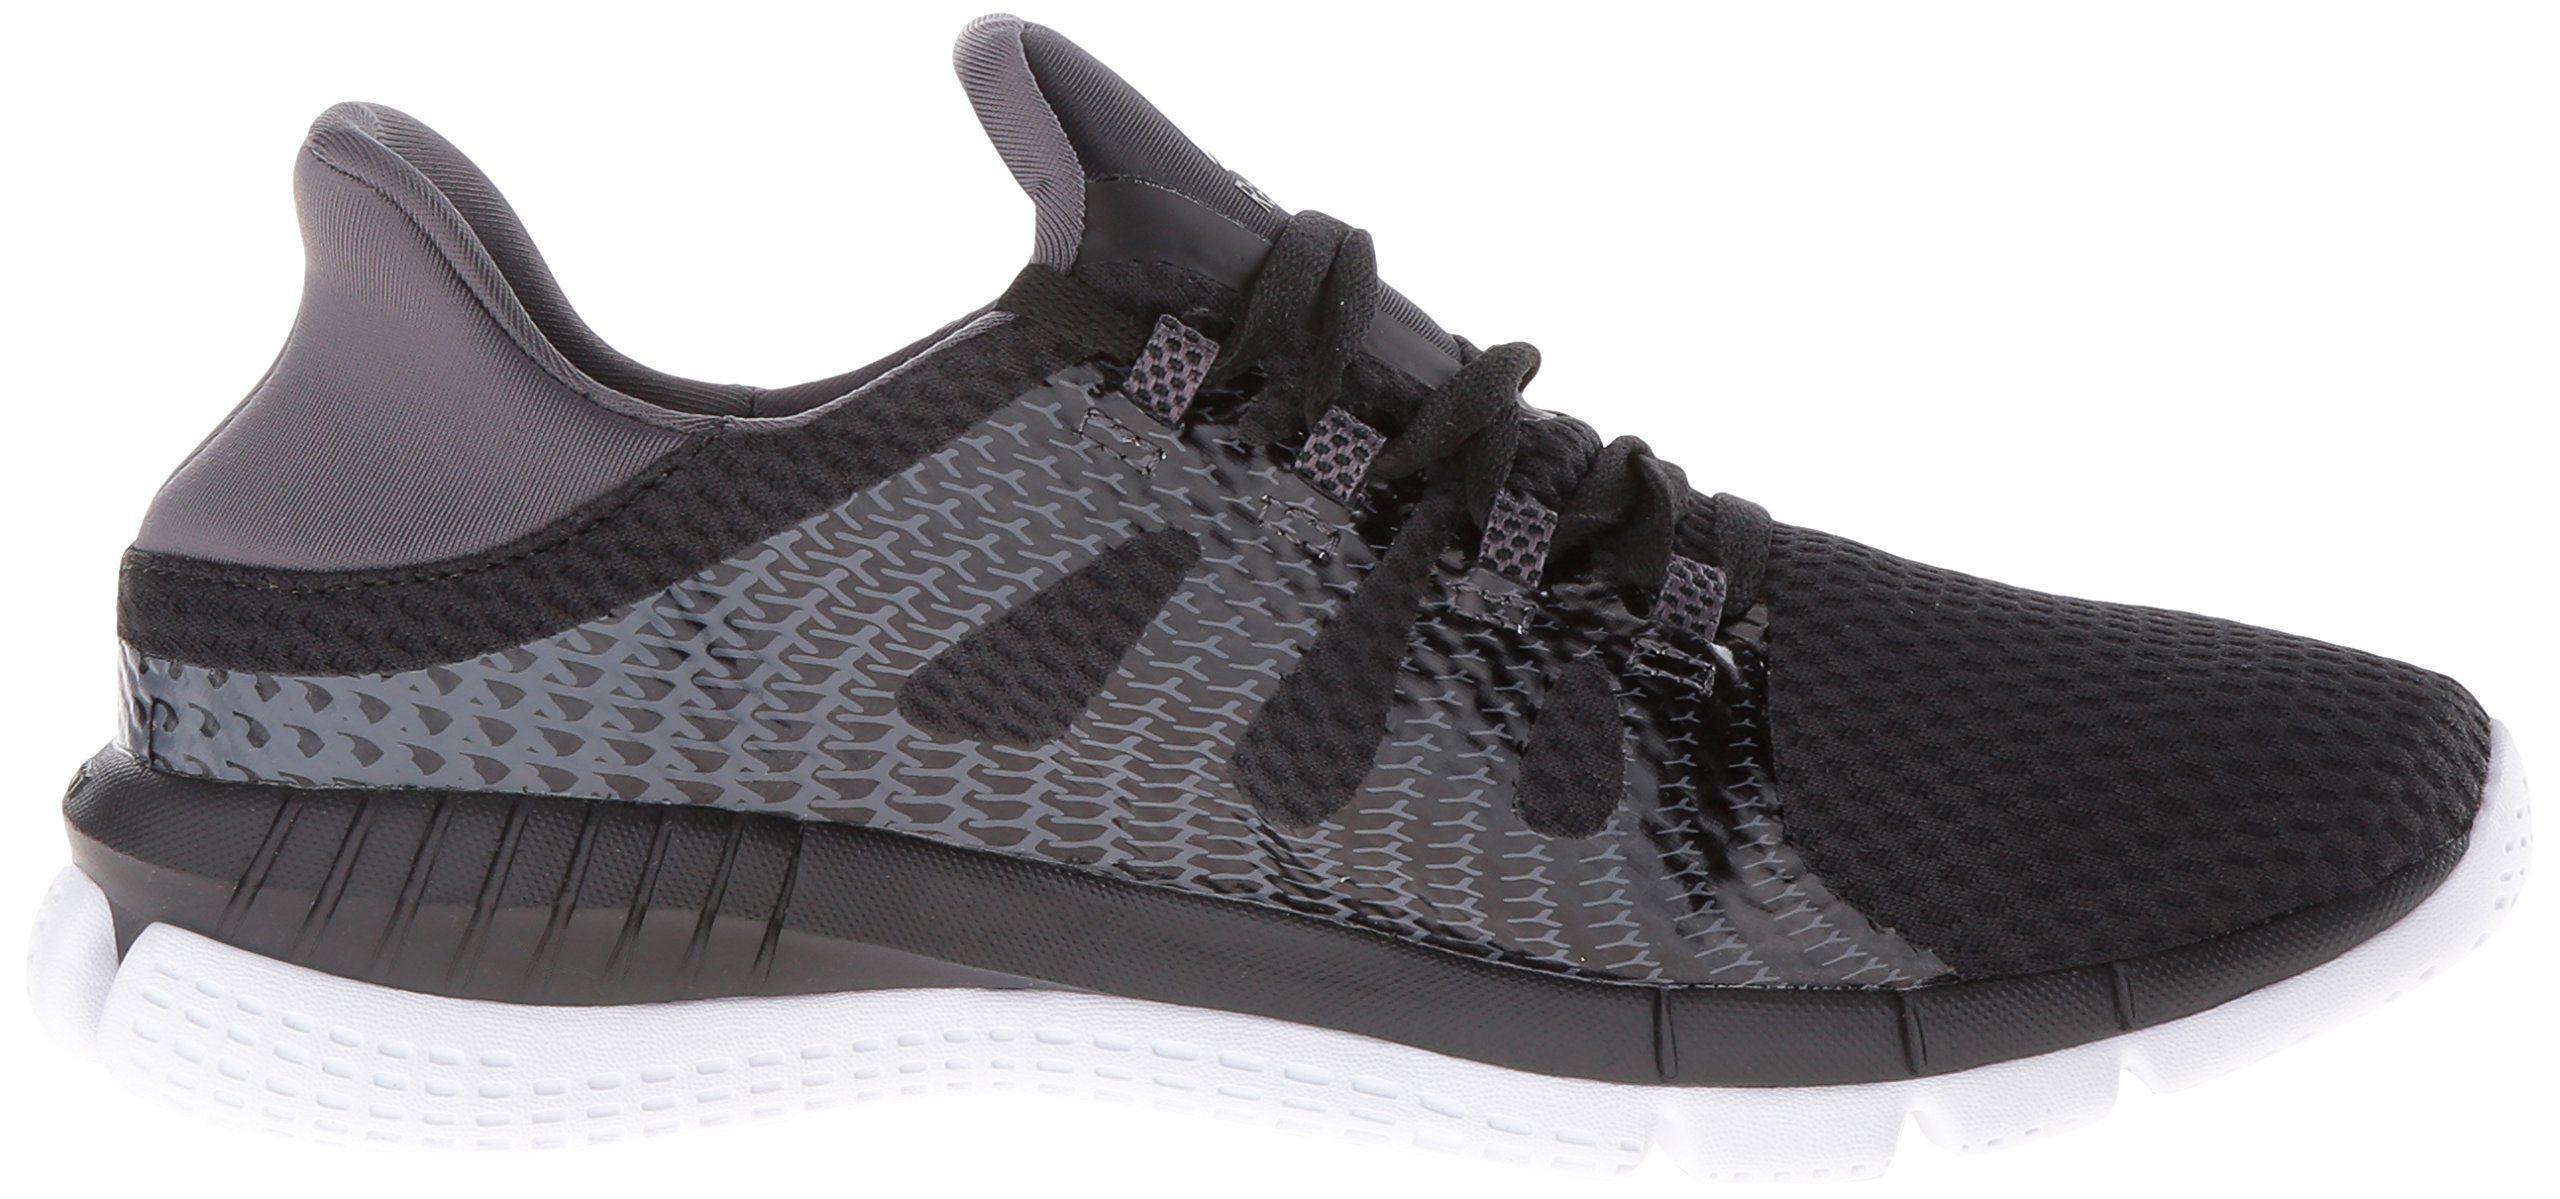 37d7c159410d2c Reebok Womens Zprint Her MTM Running Shoes Black Ash Grey White 7.5 BM US